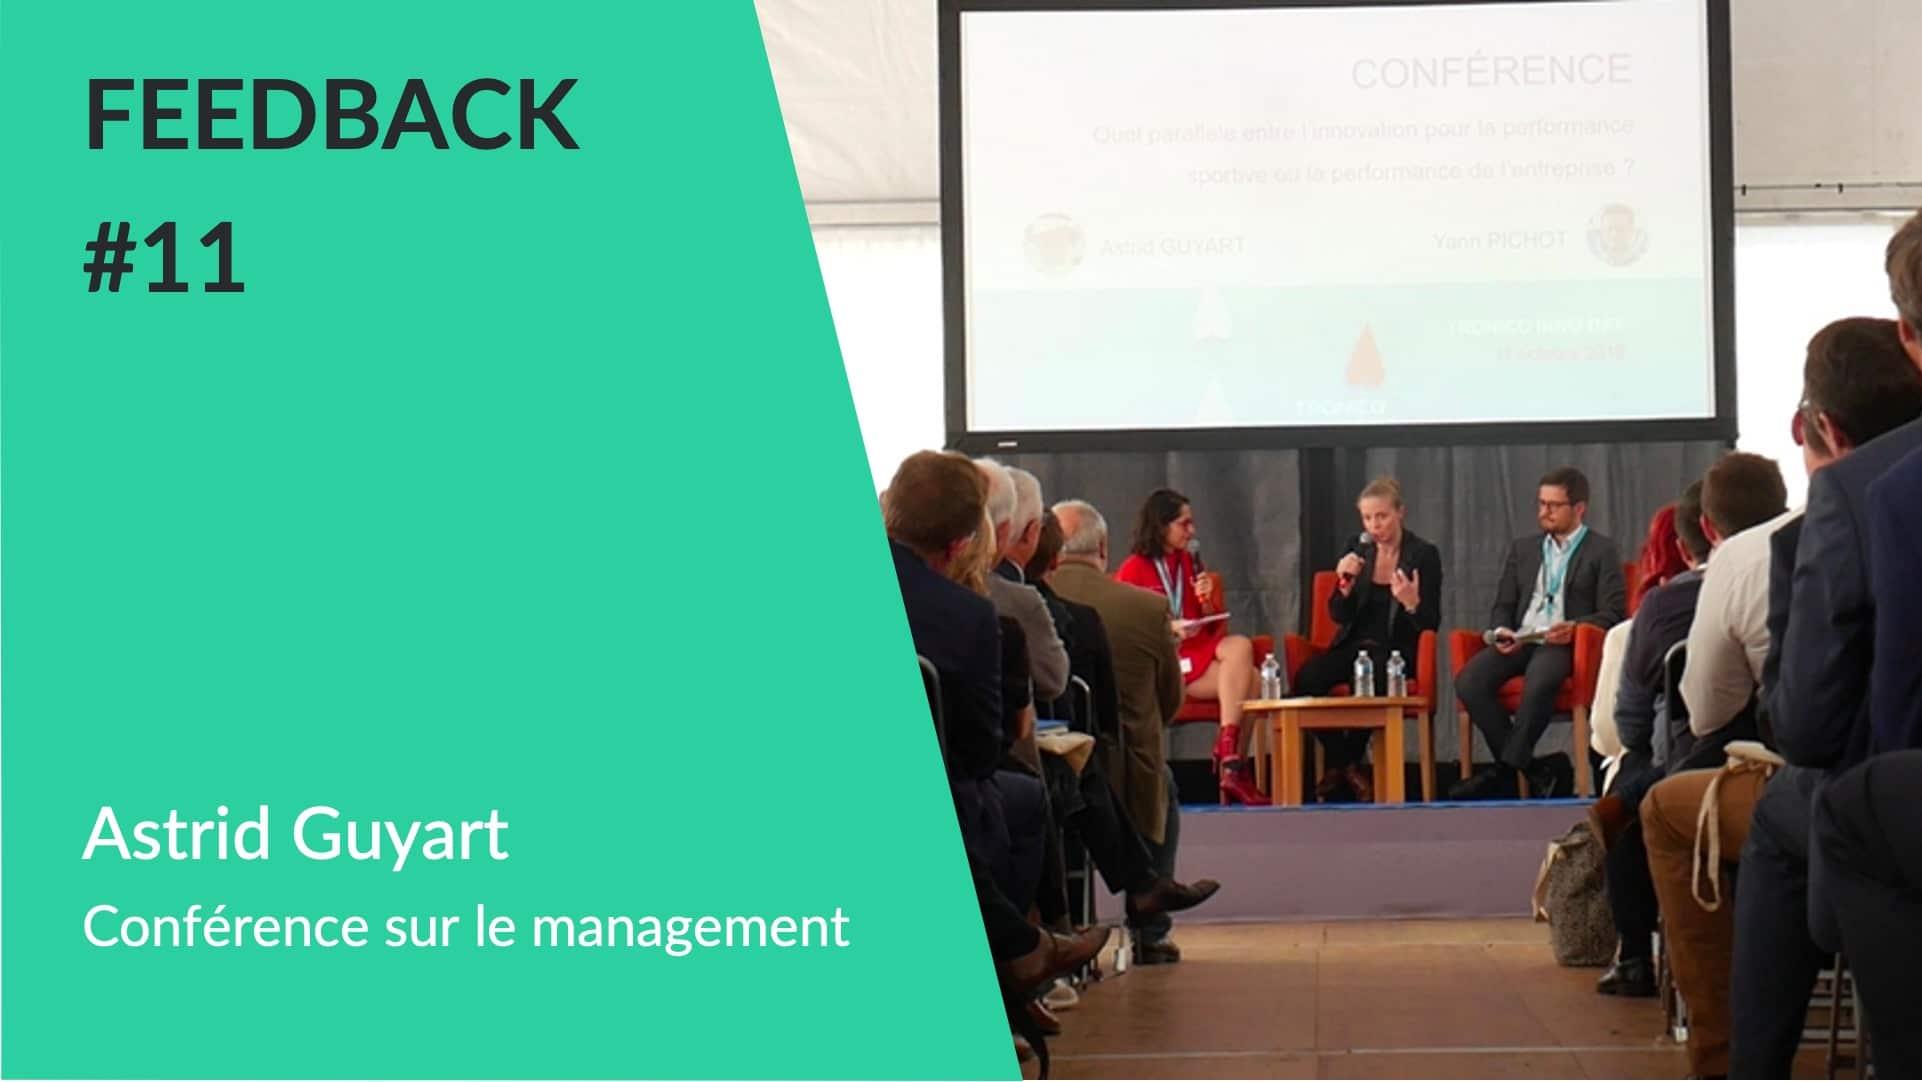 conférence Astrid Guyart Management Innovation